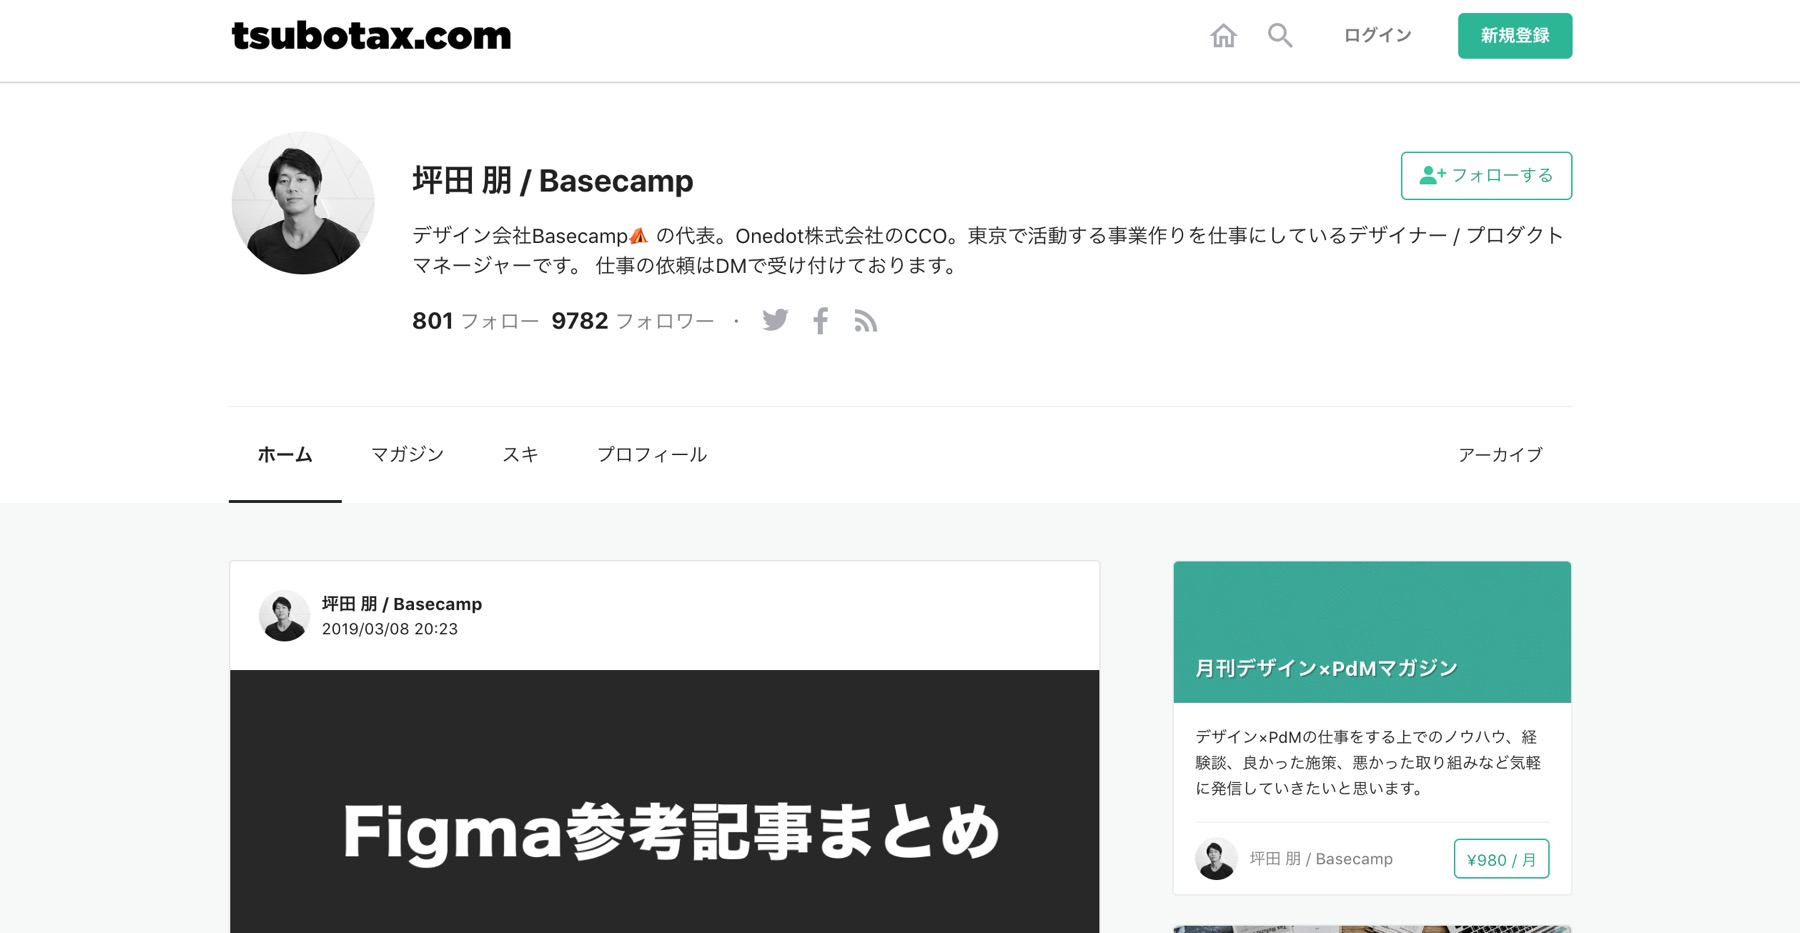 tsubotax.com